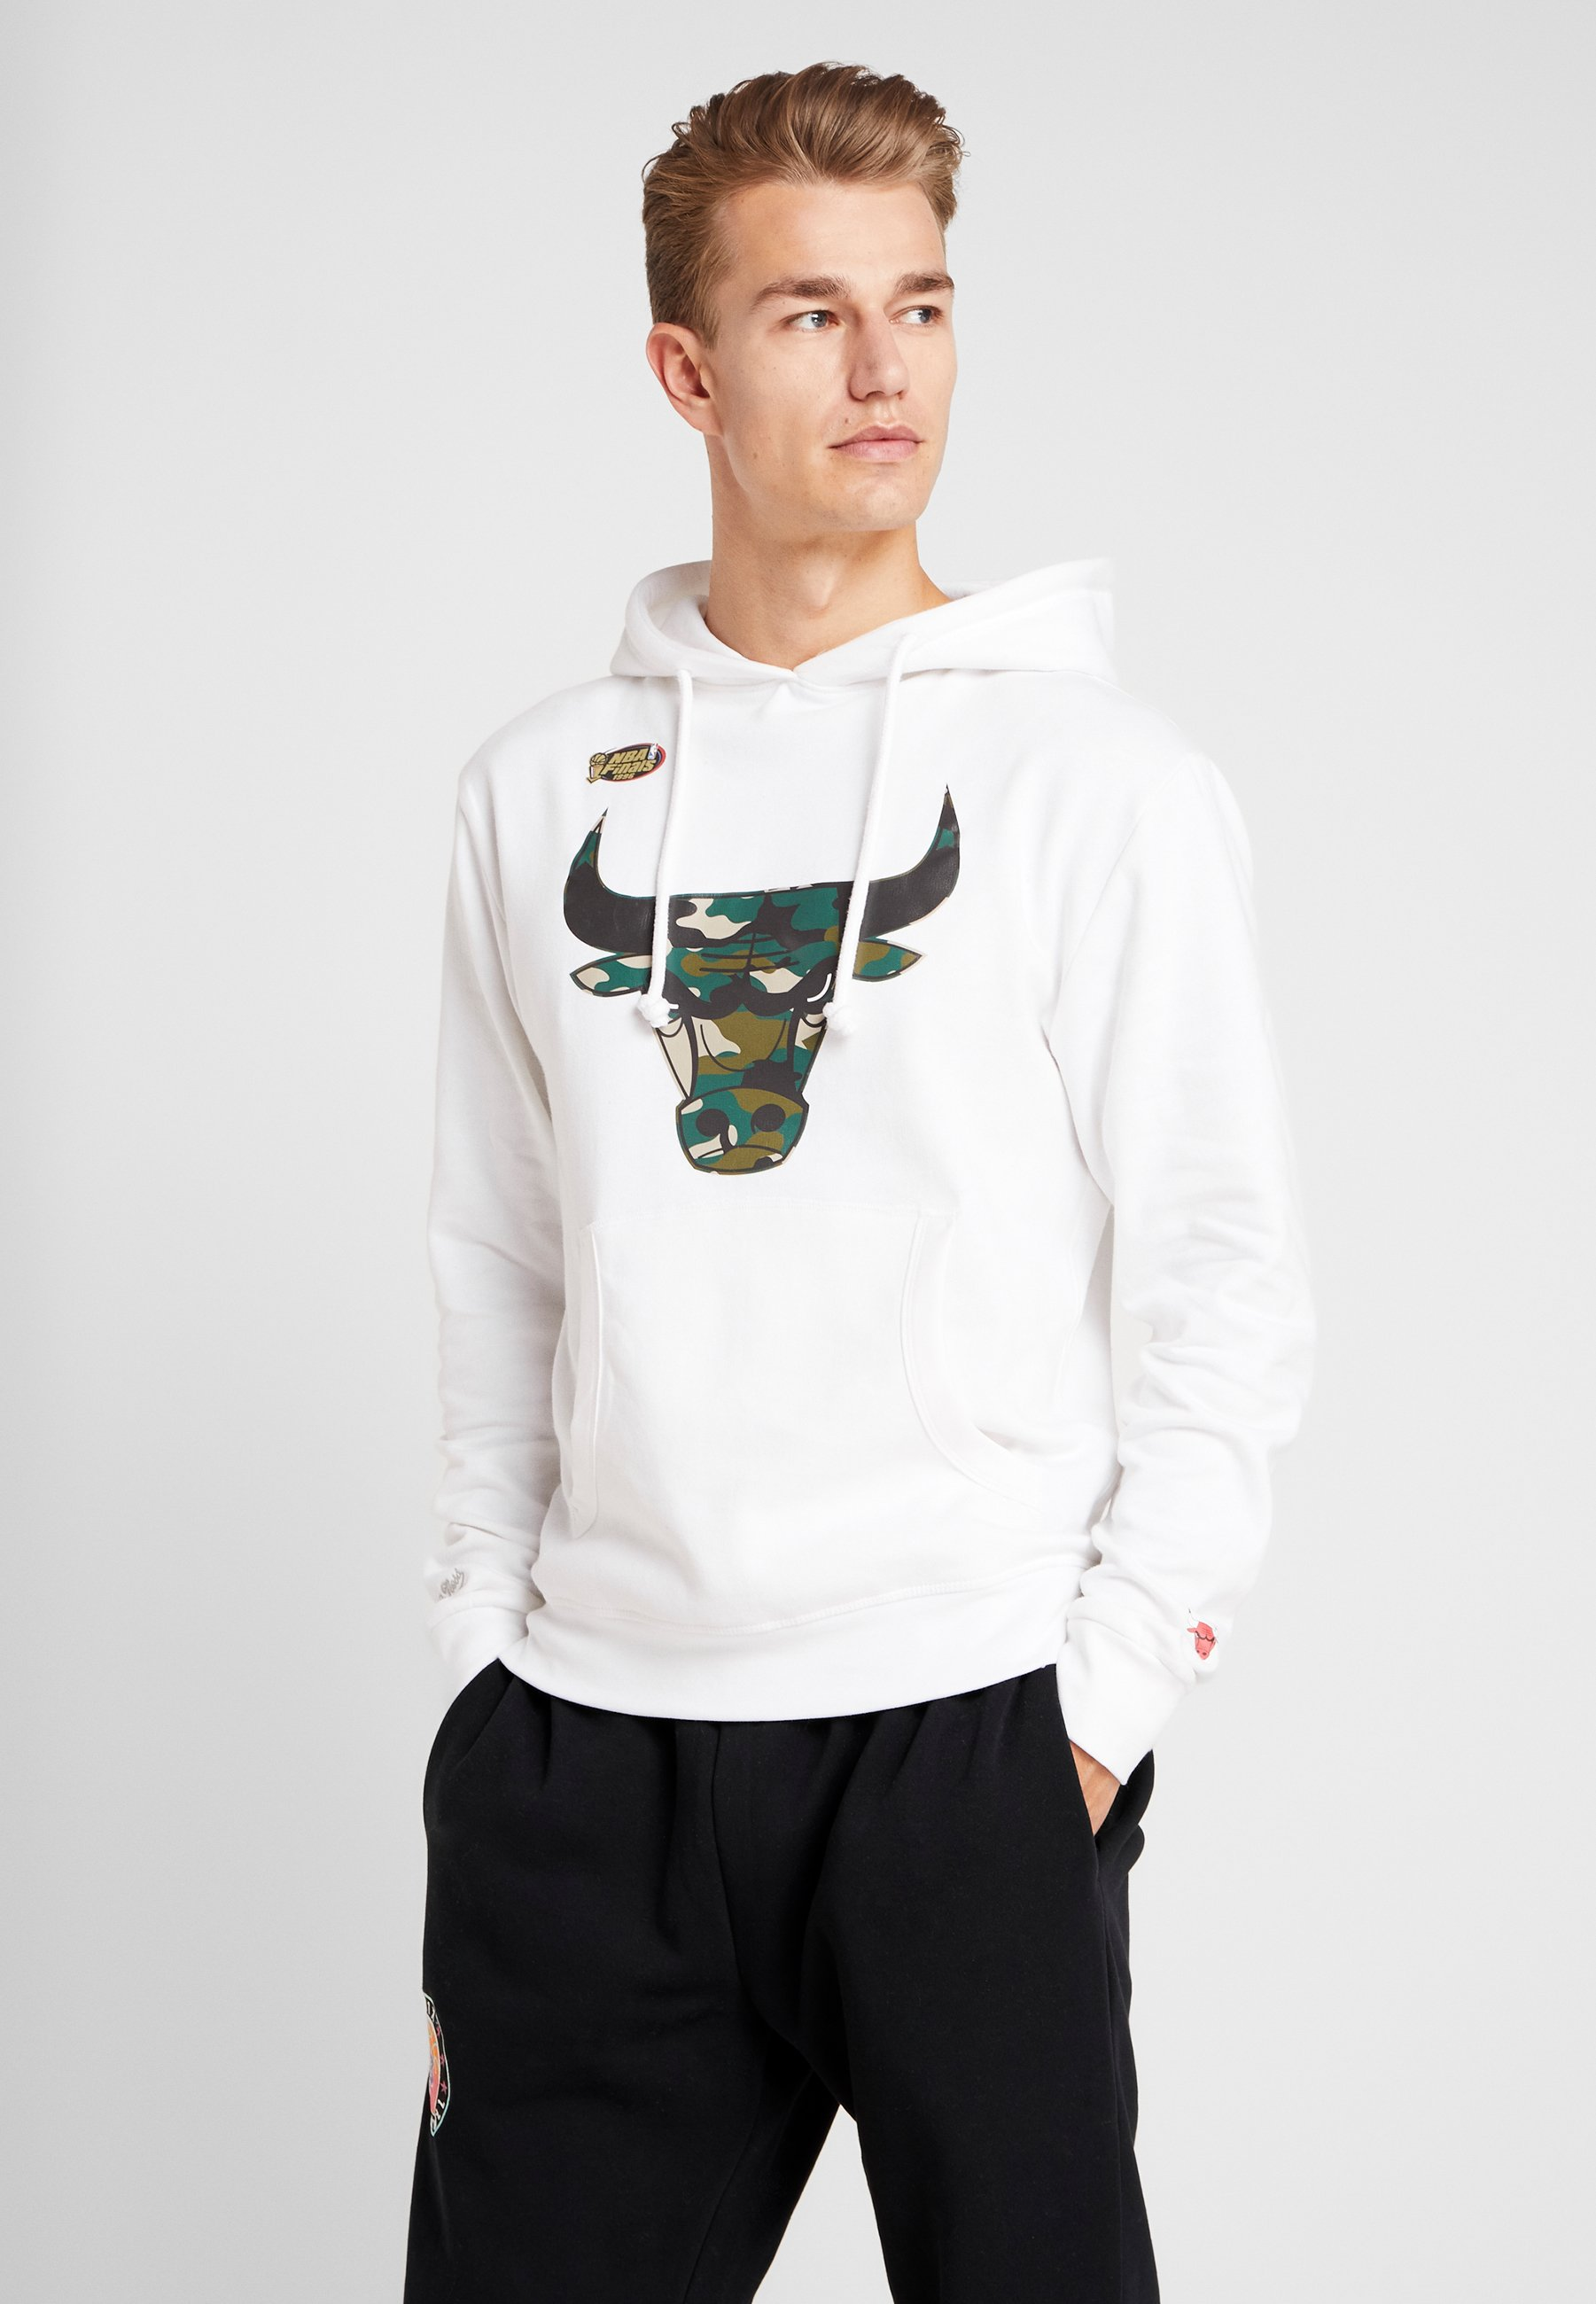 Woodland Ness Camo Nba Bulls De Mitchellamp; Supporter White Chicago HoodyArticle ymNwv8On0P